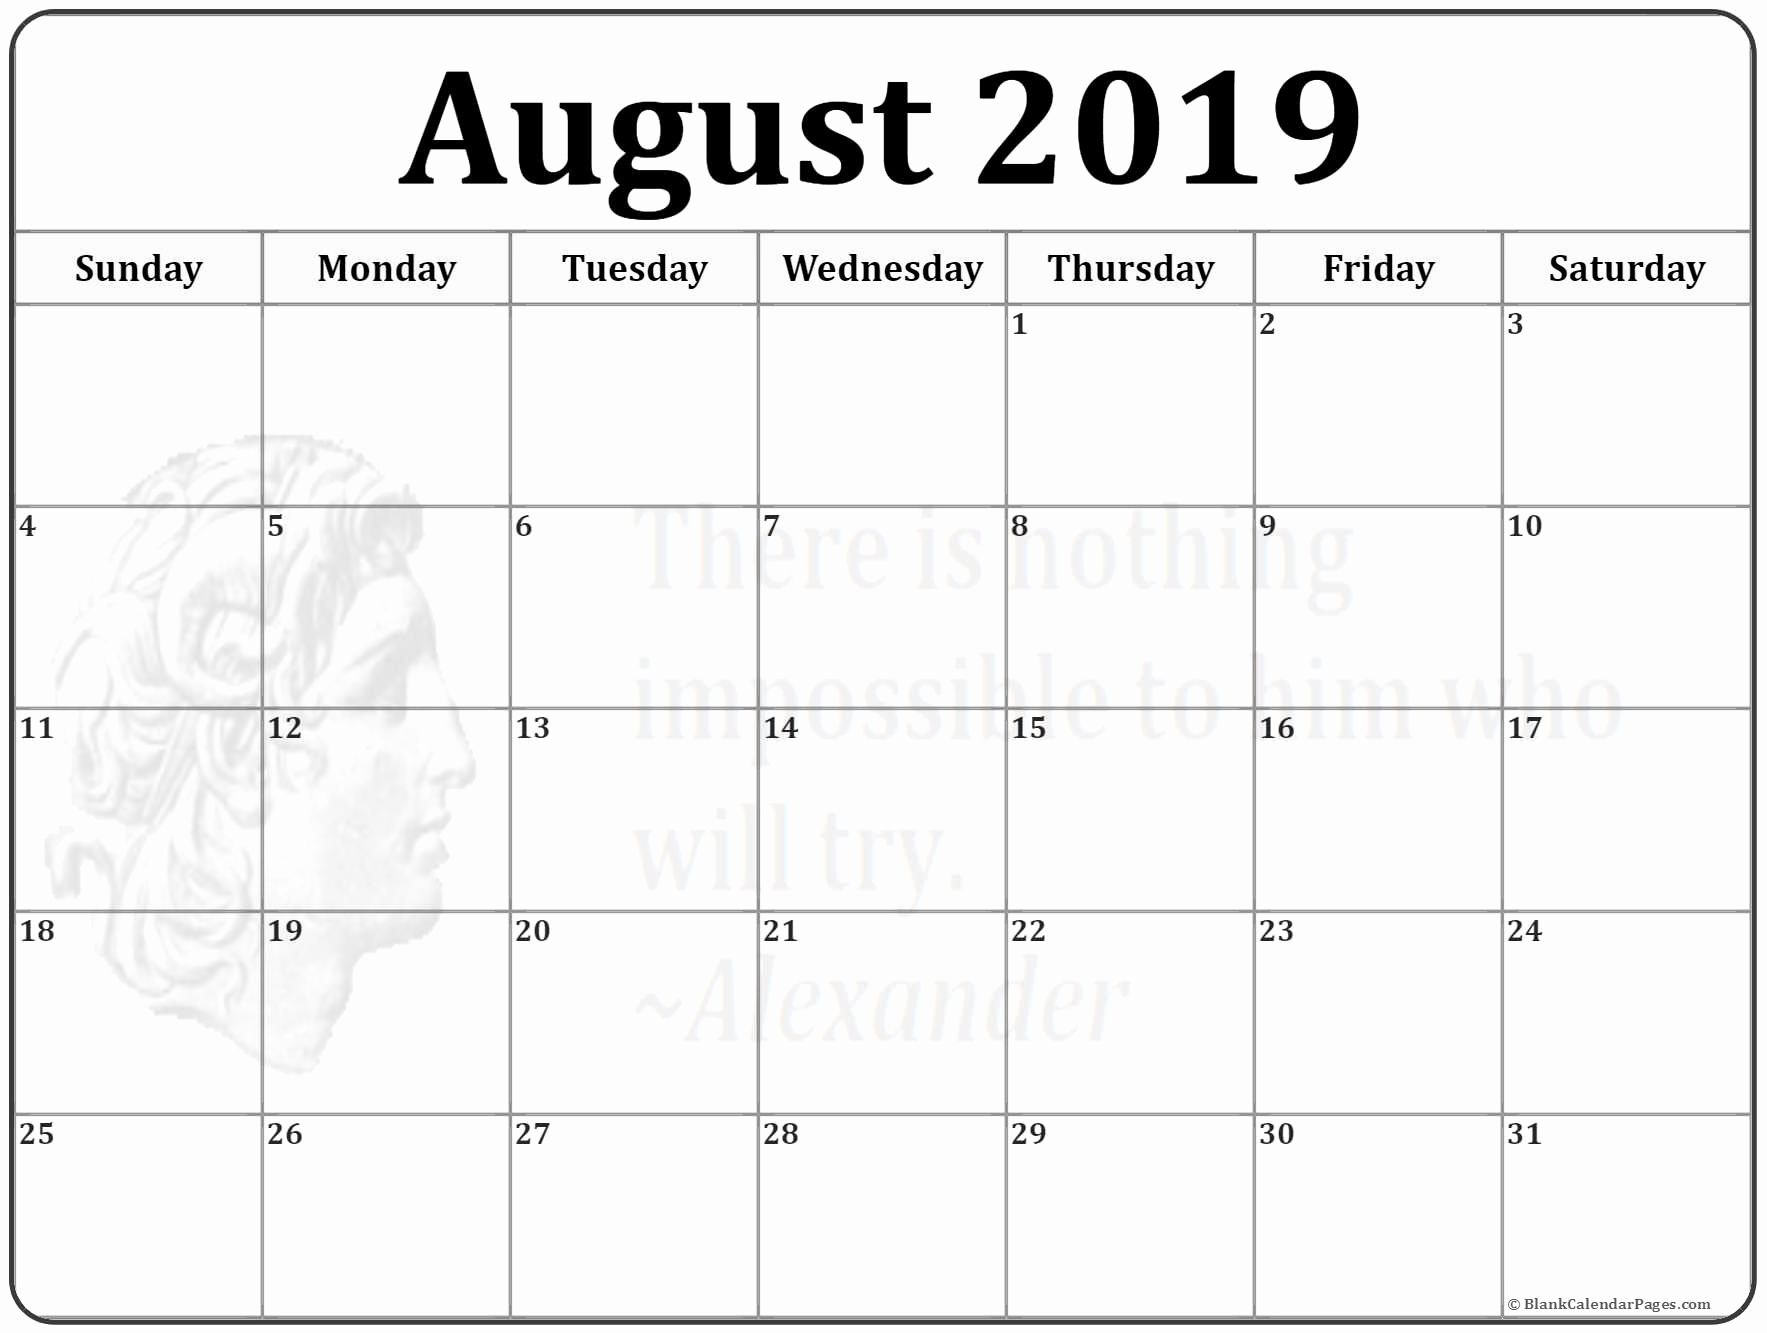 picture regarding August Printable Calendars identify August 2019 Calendar Blank #august #august2019 #2019calendar